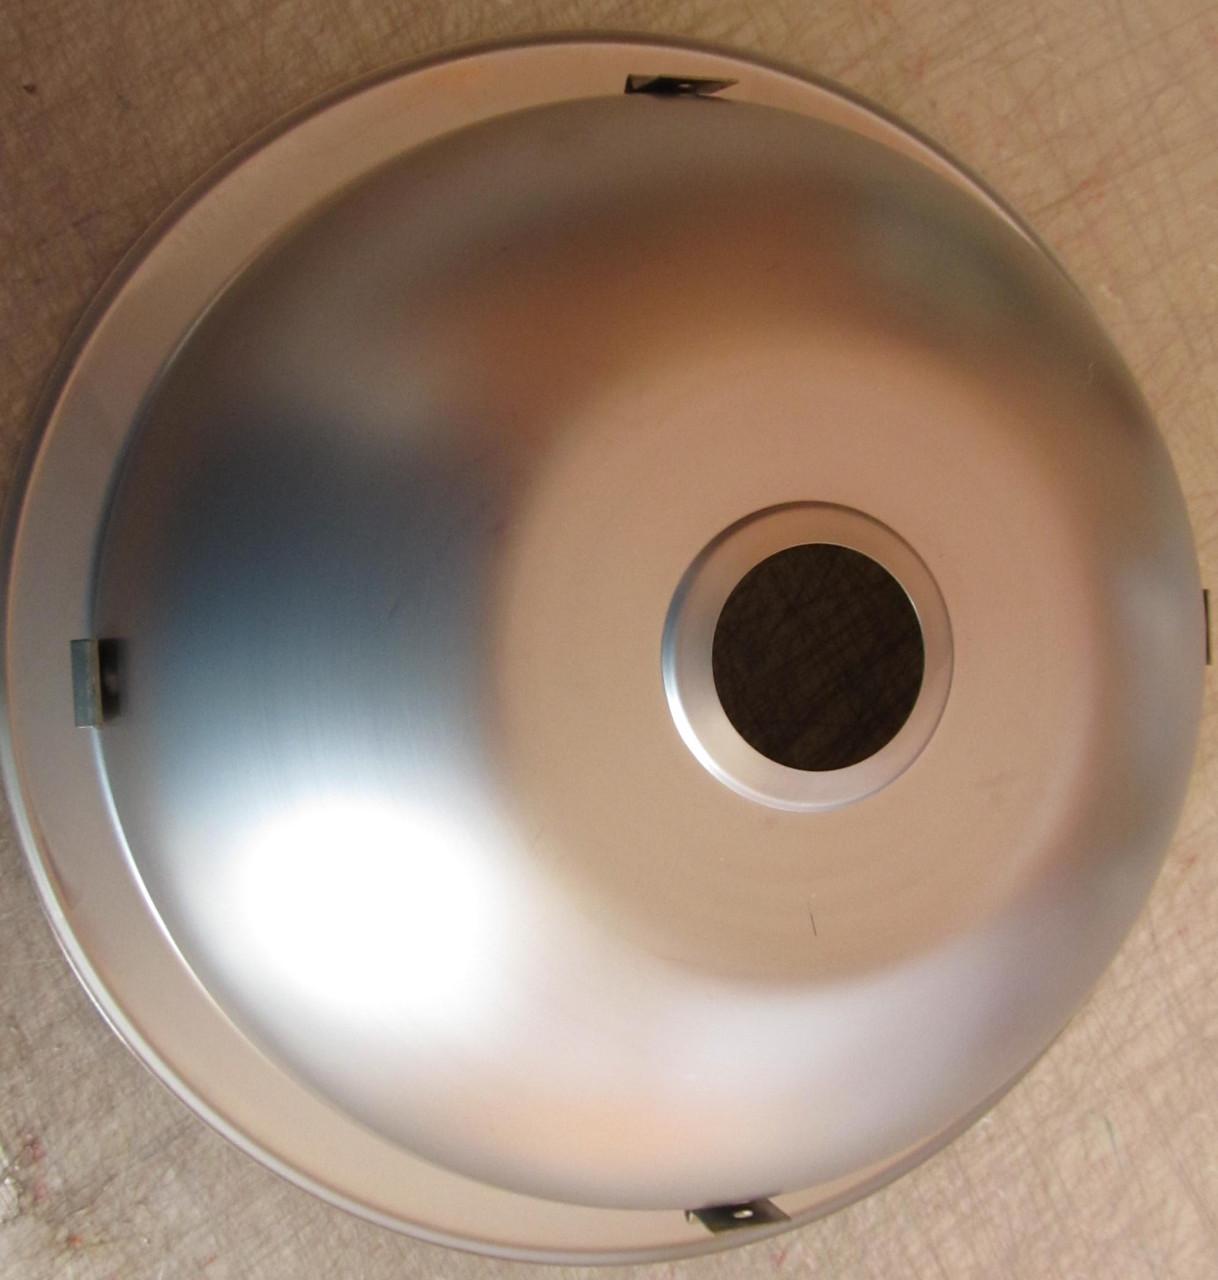 "Round Sink - 10 3/4"" Stainless Steel (10-1026)"